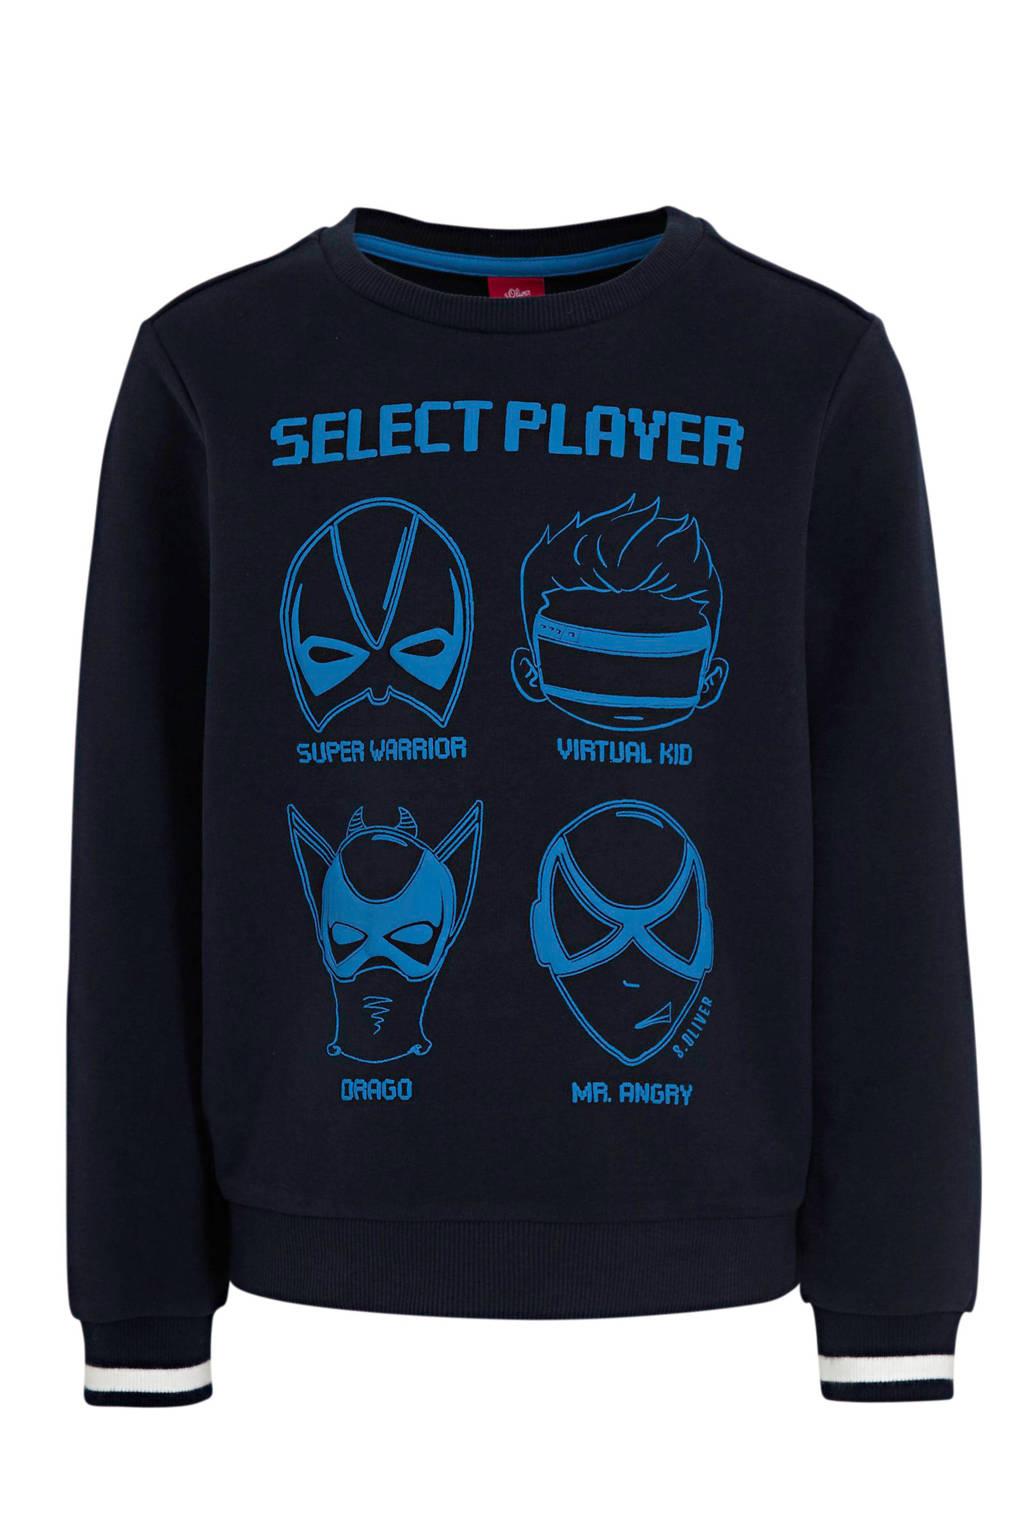 s.Oliver sweater met printopdruk donkerblauw/blauw, Donkerblauw/blauw